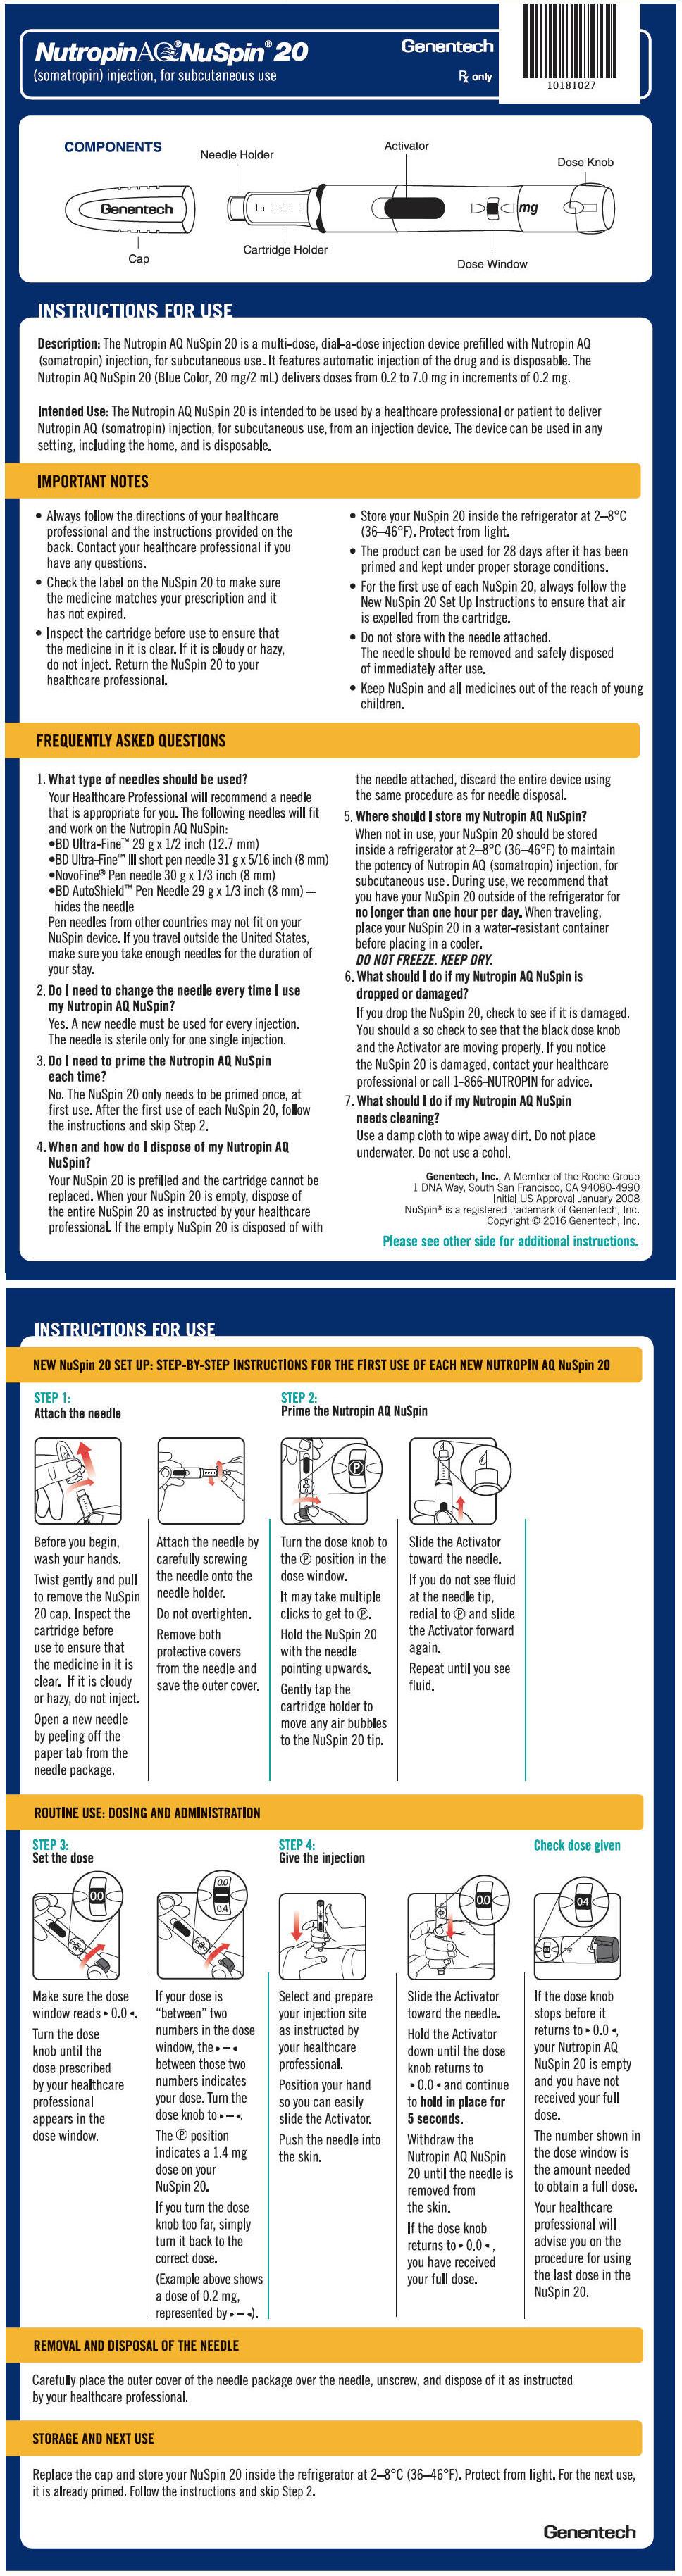 PRINCIPAL DISPLAY PANEL - 20 mg NuSpin IFU